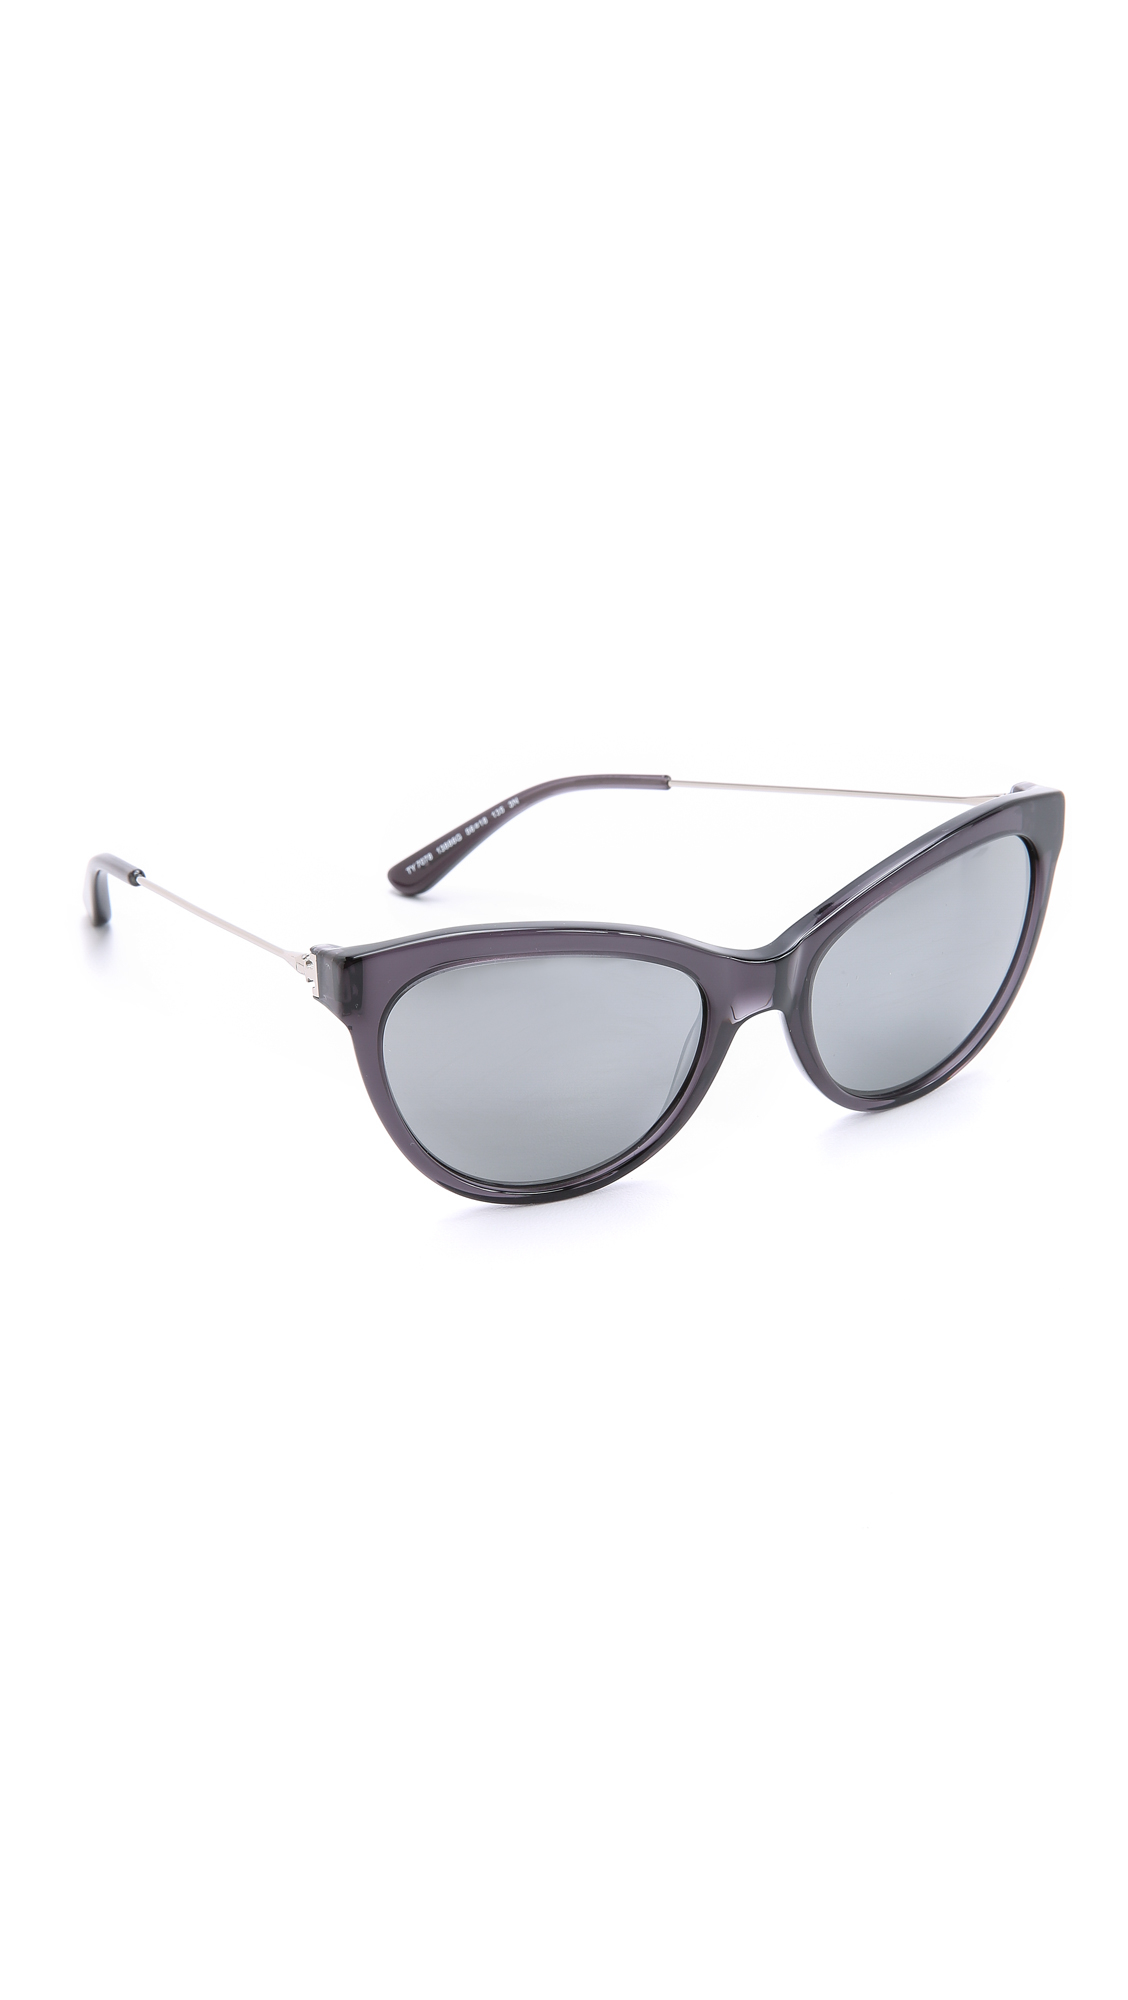 efb390855c7 Lyst - Tory Burch Cat Eye Sunglasses - Milky Smoke Silver steel Flash in  Gray